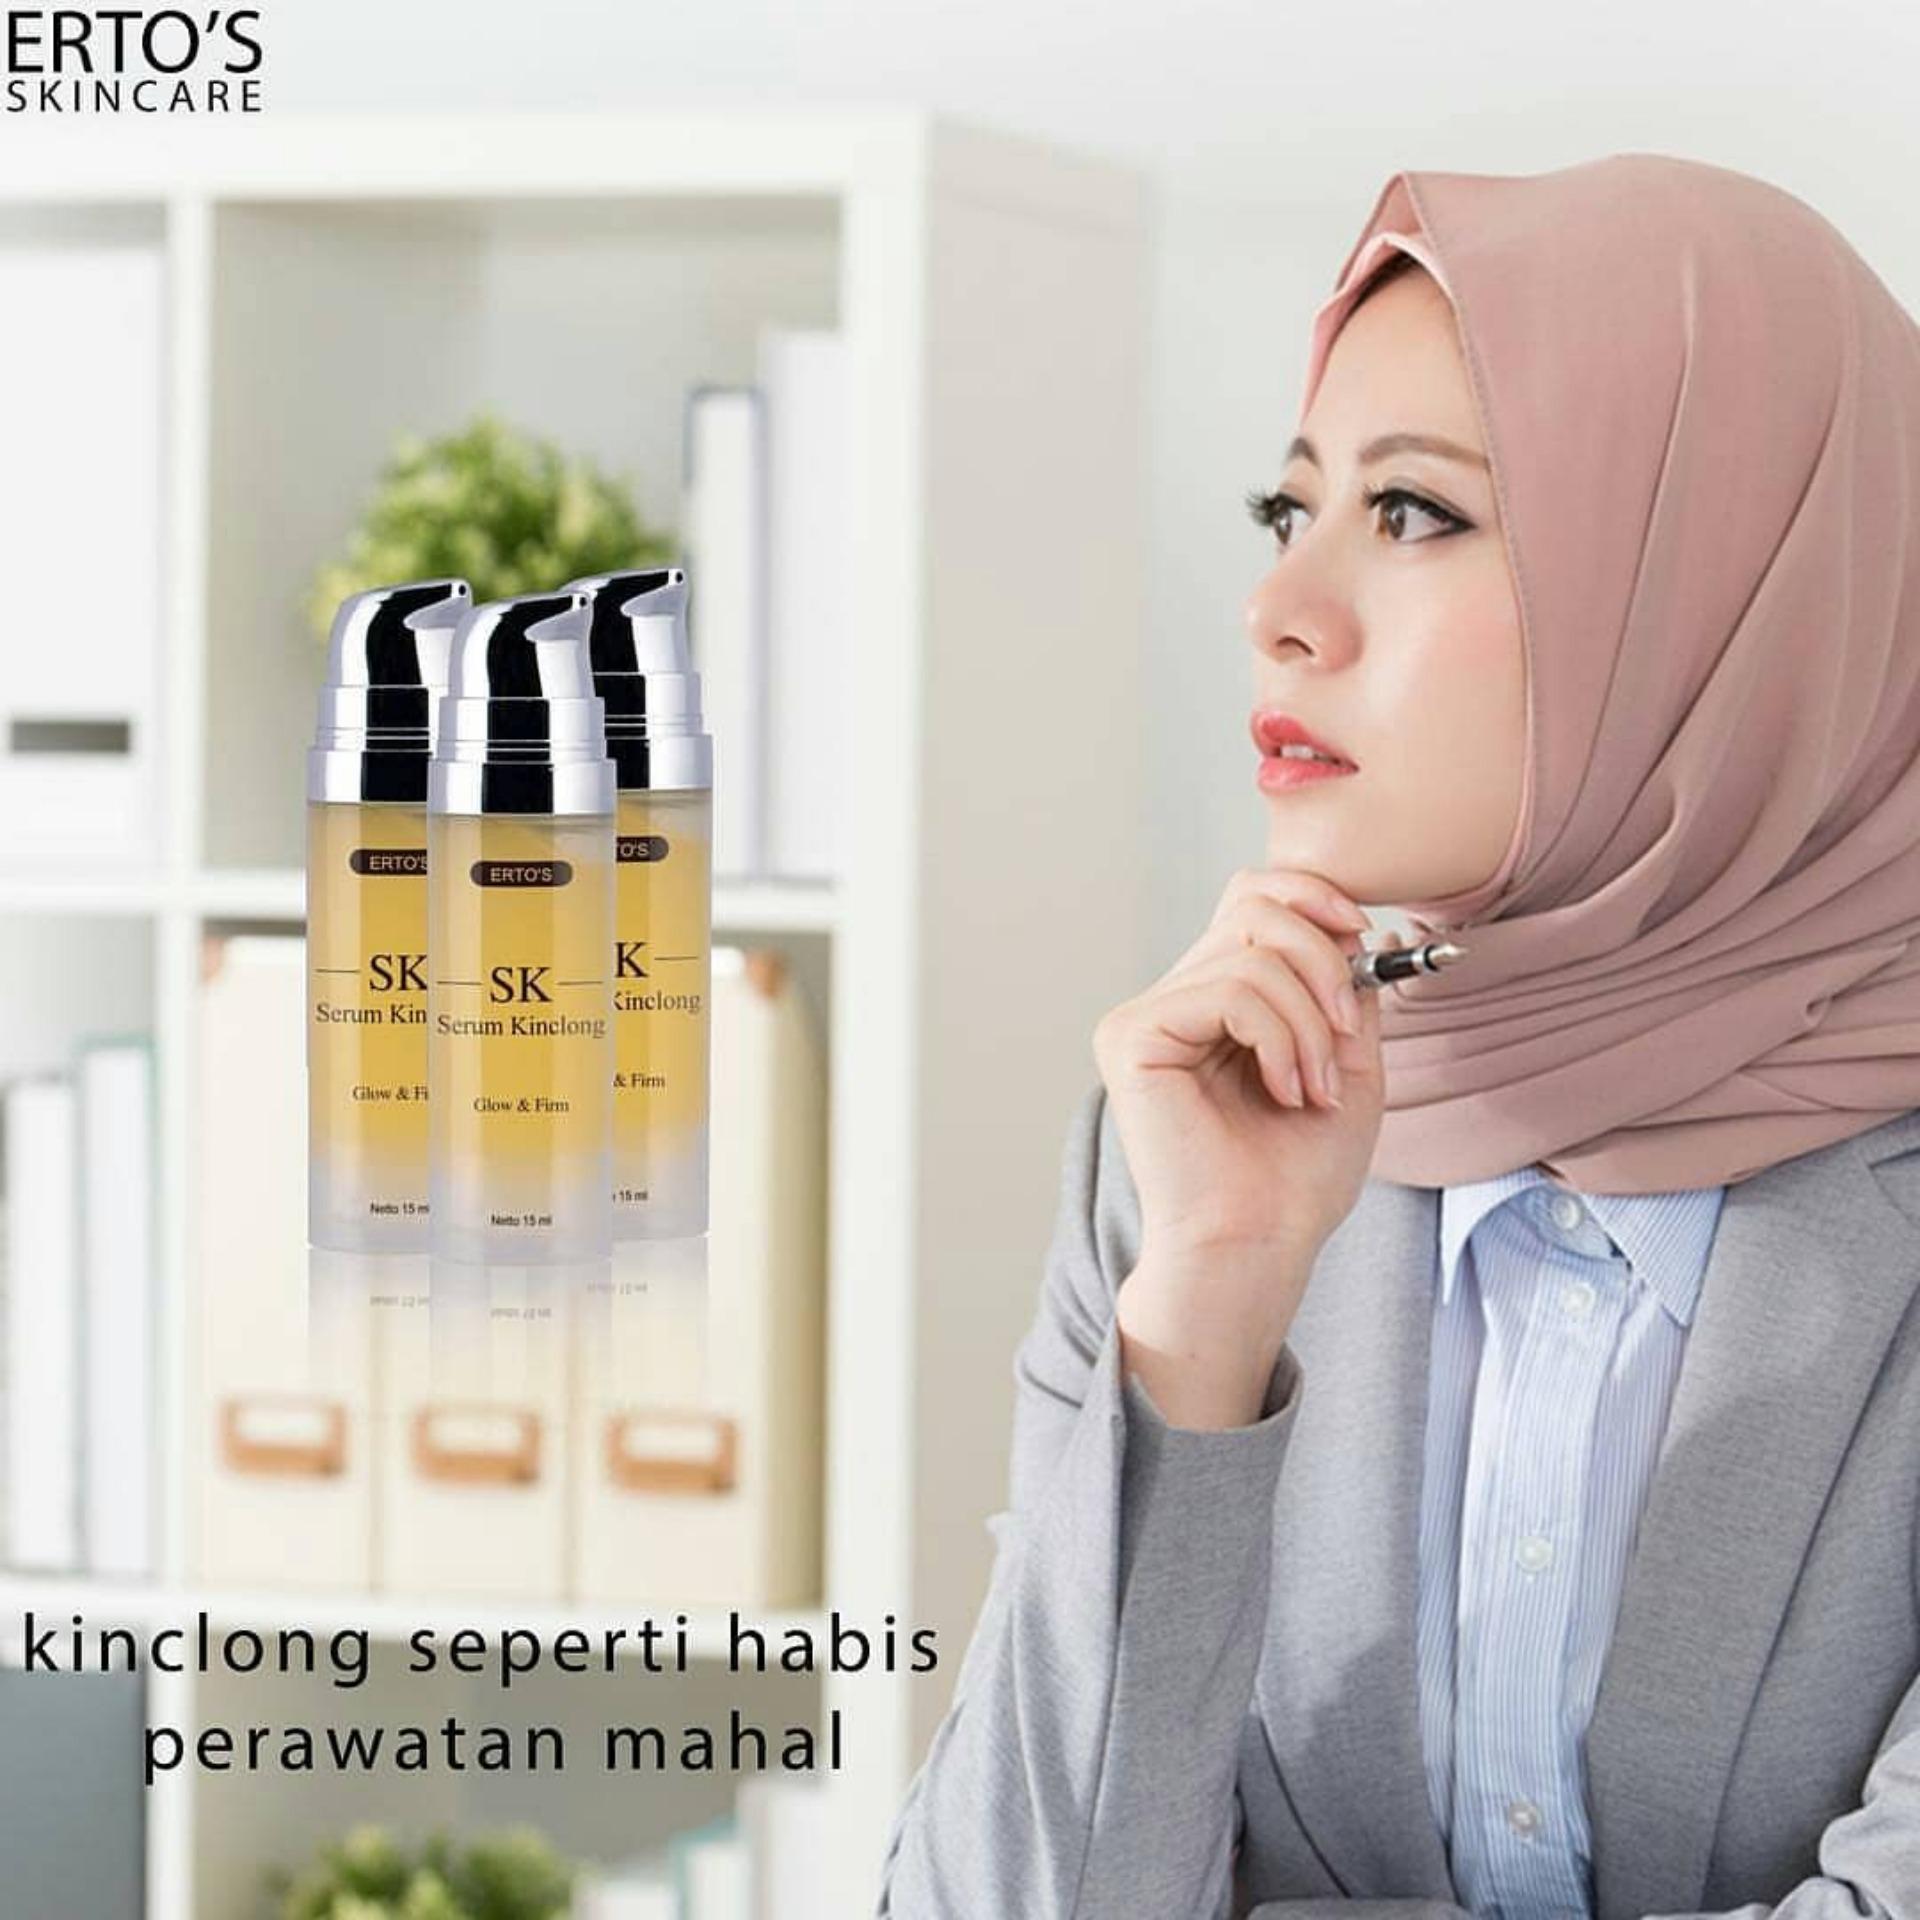 Kelebihan Ori Ertos Serum Kinclong Sk Pencerah Wajah Skincare Original Bpom 3